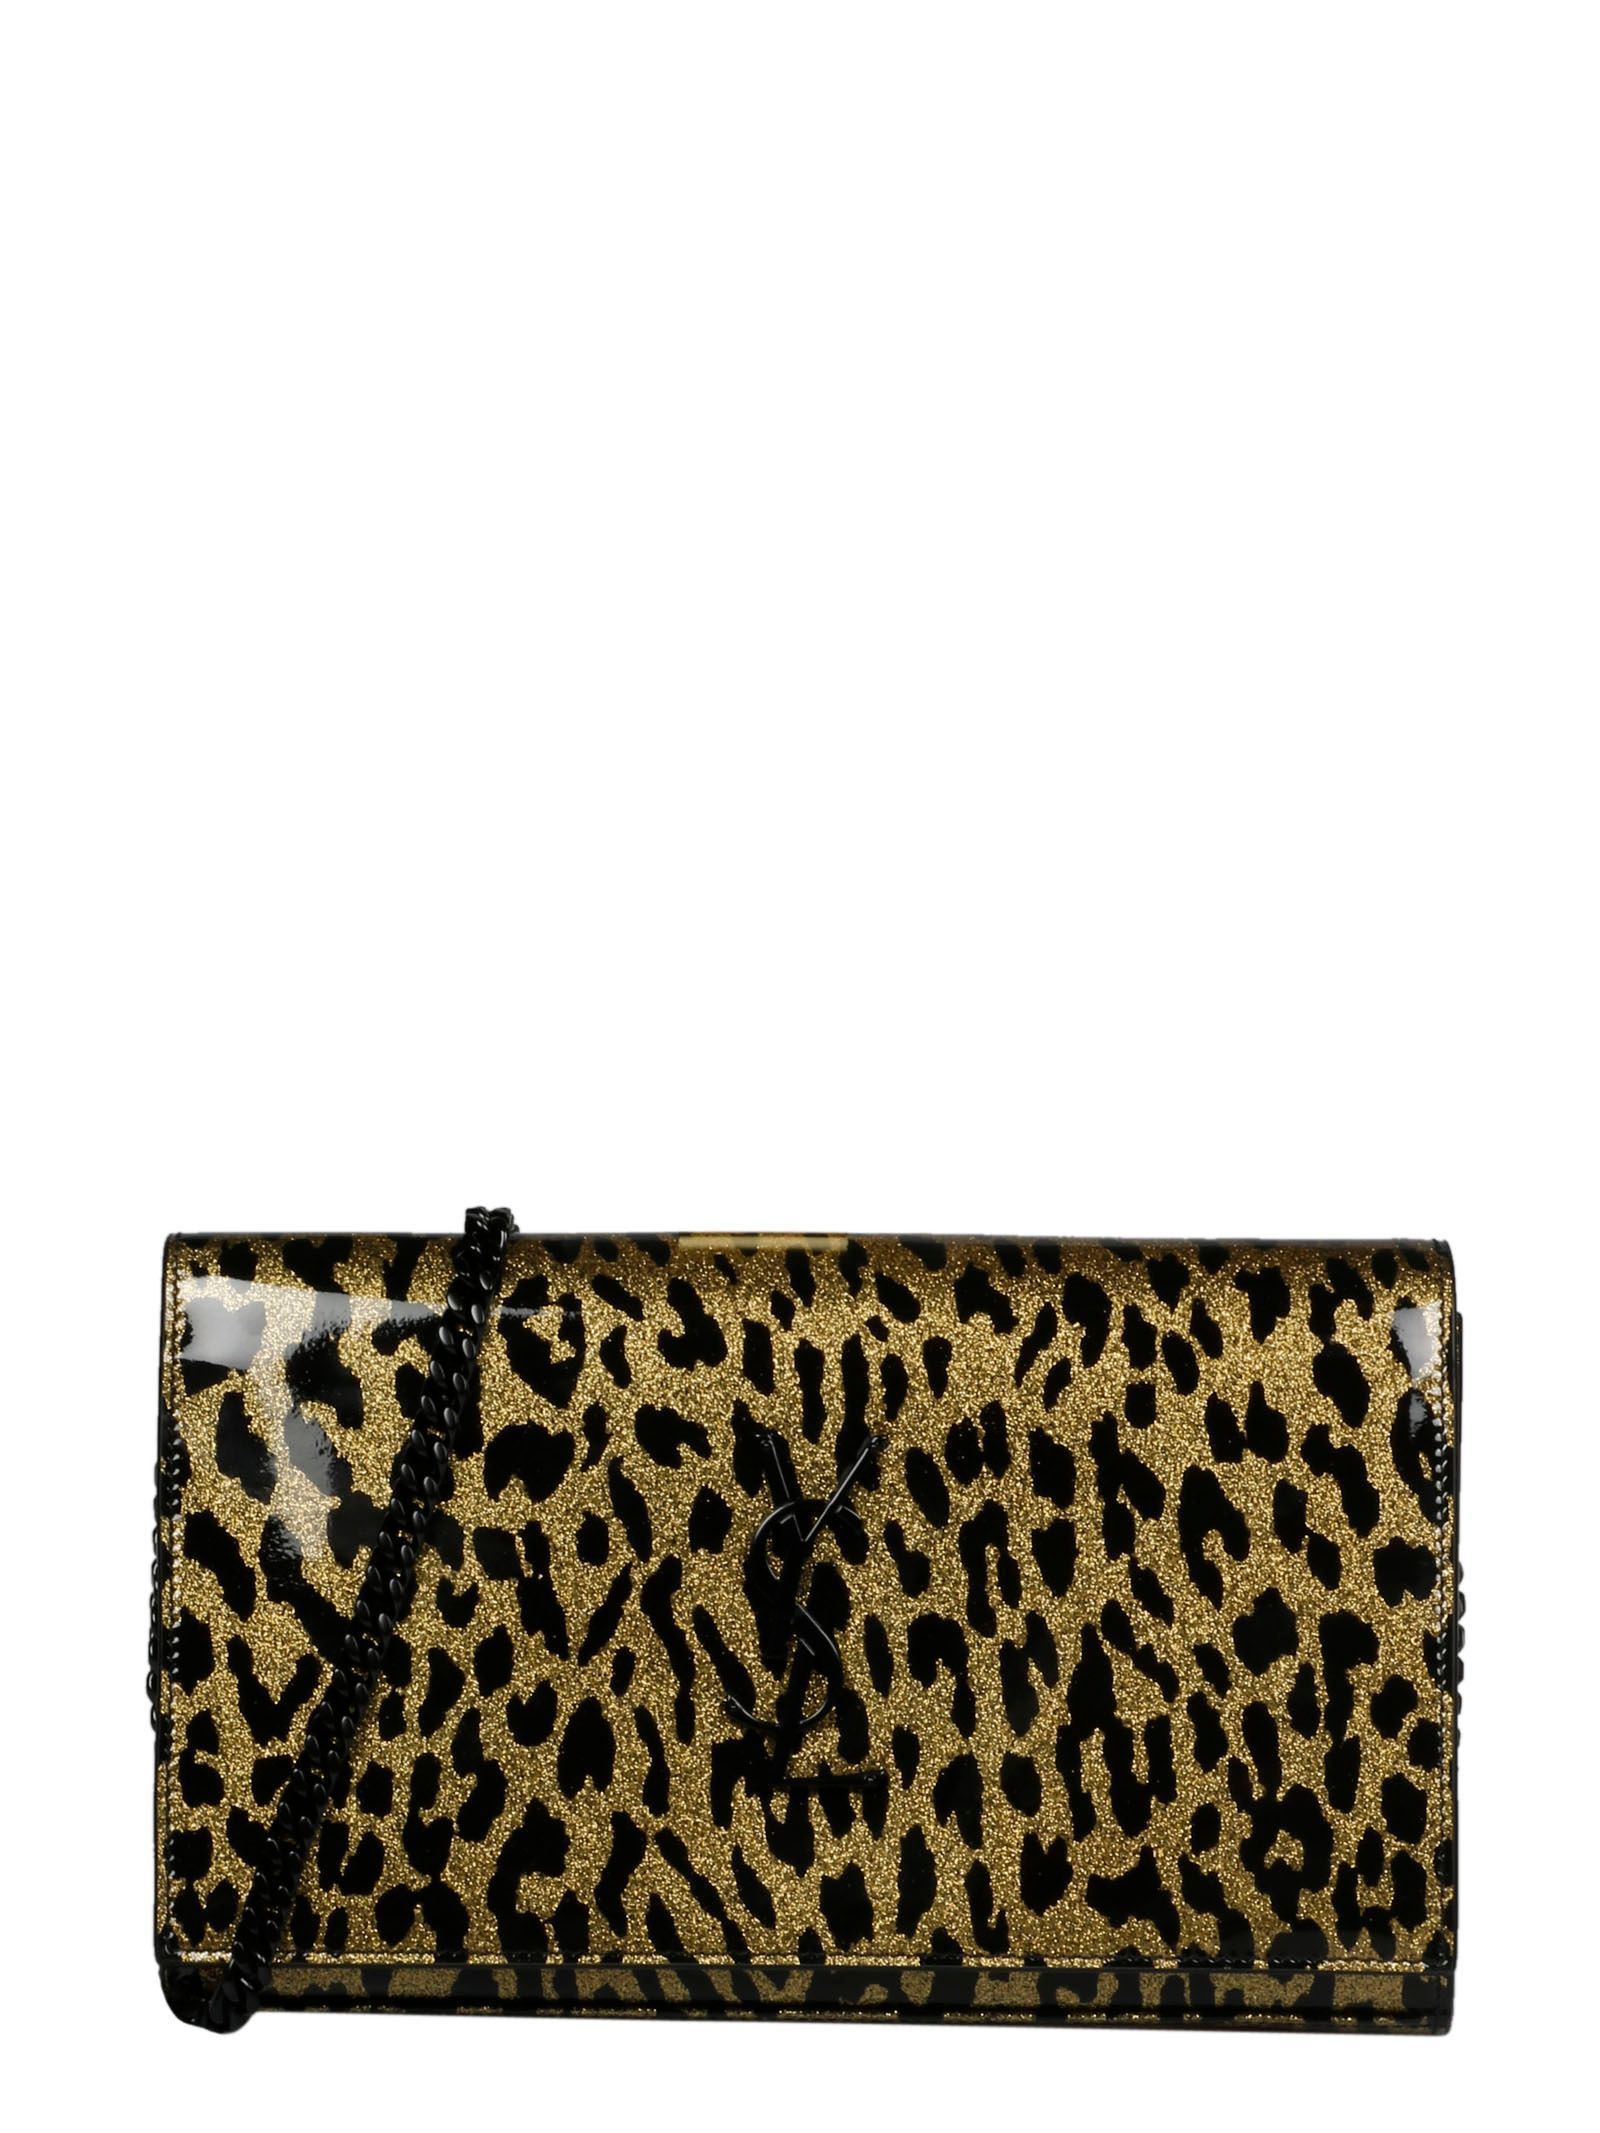 SAINT LAURENT WOMEN'S 3778291KG2U8063 GOLD PLASTIC SHOULDER BAG